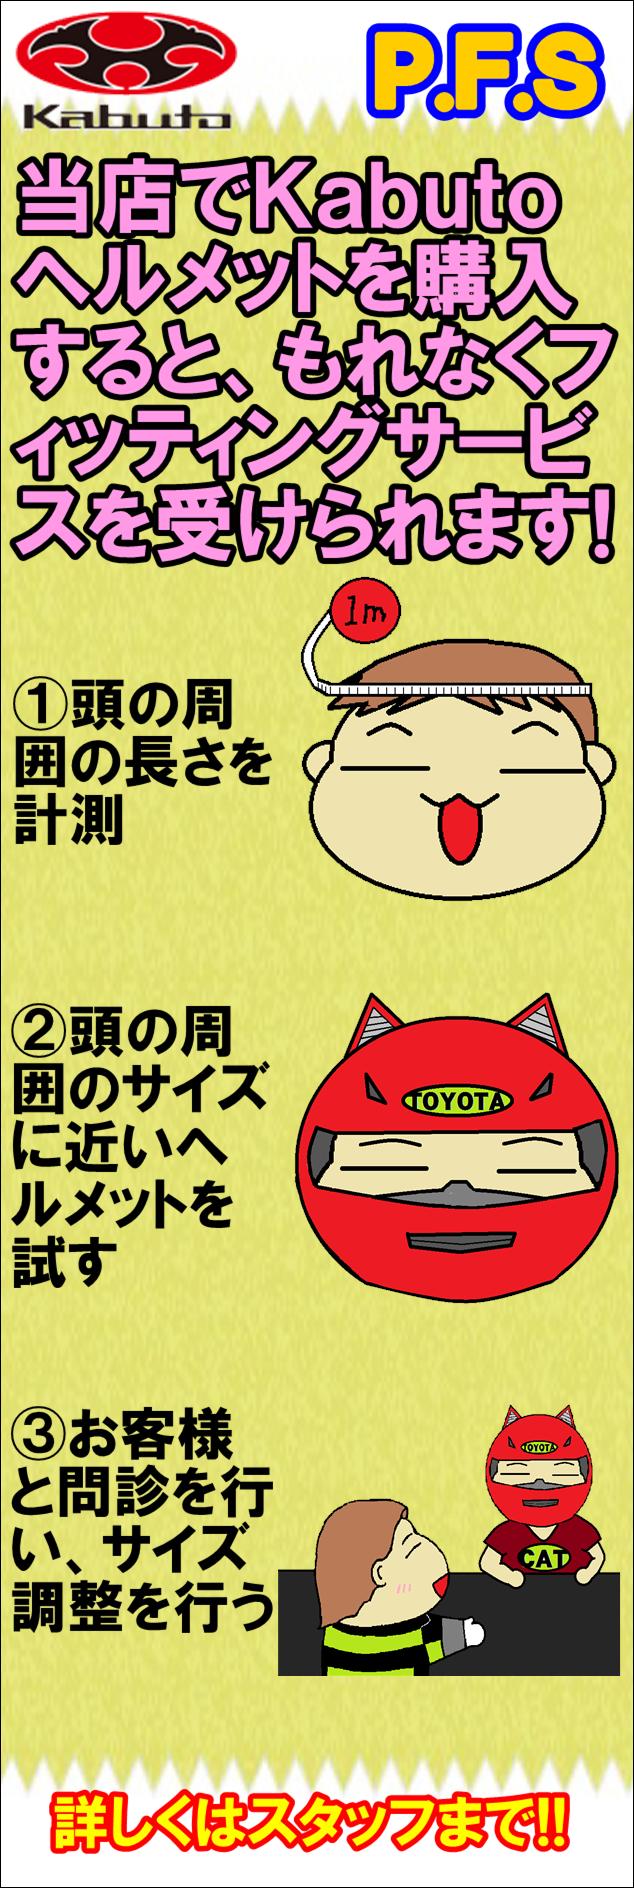 Kabuto PFS短冊POP